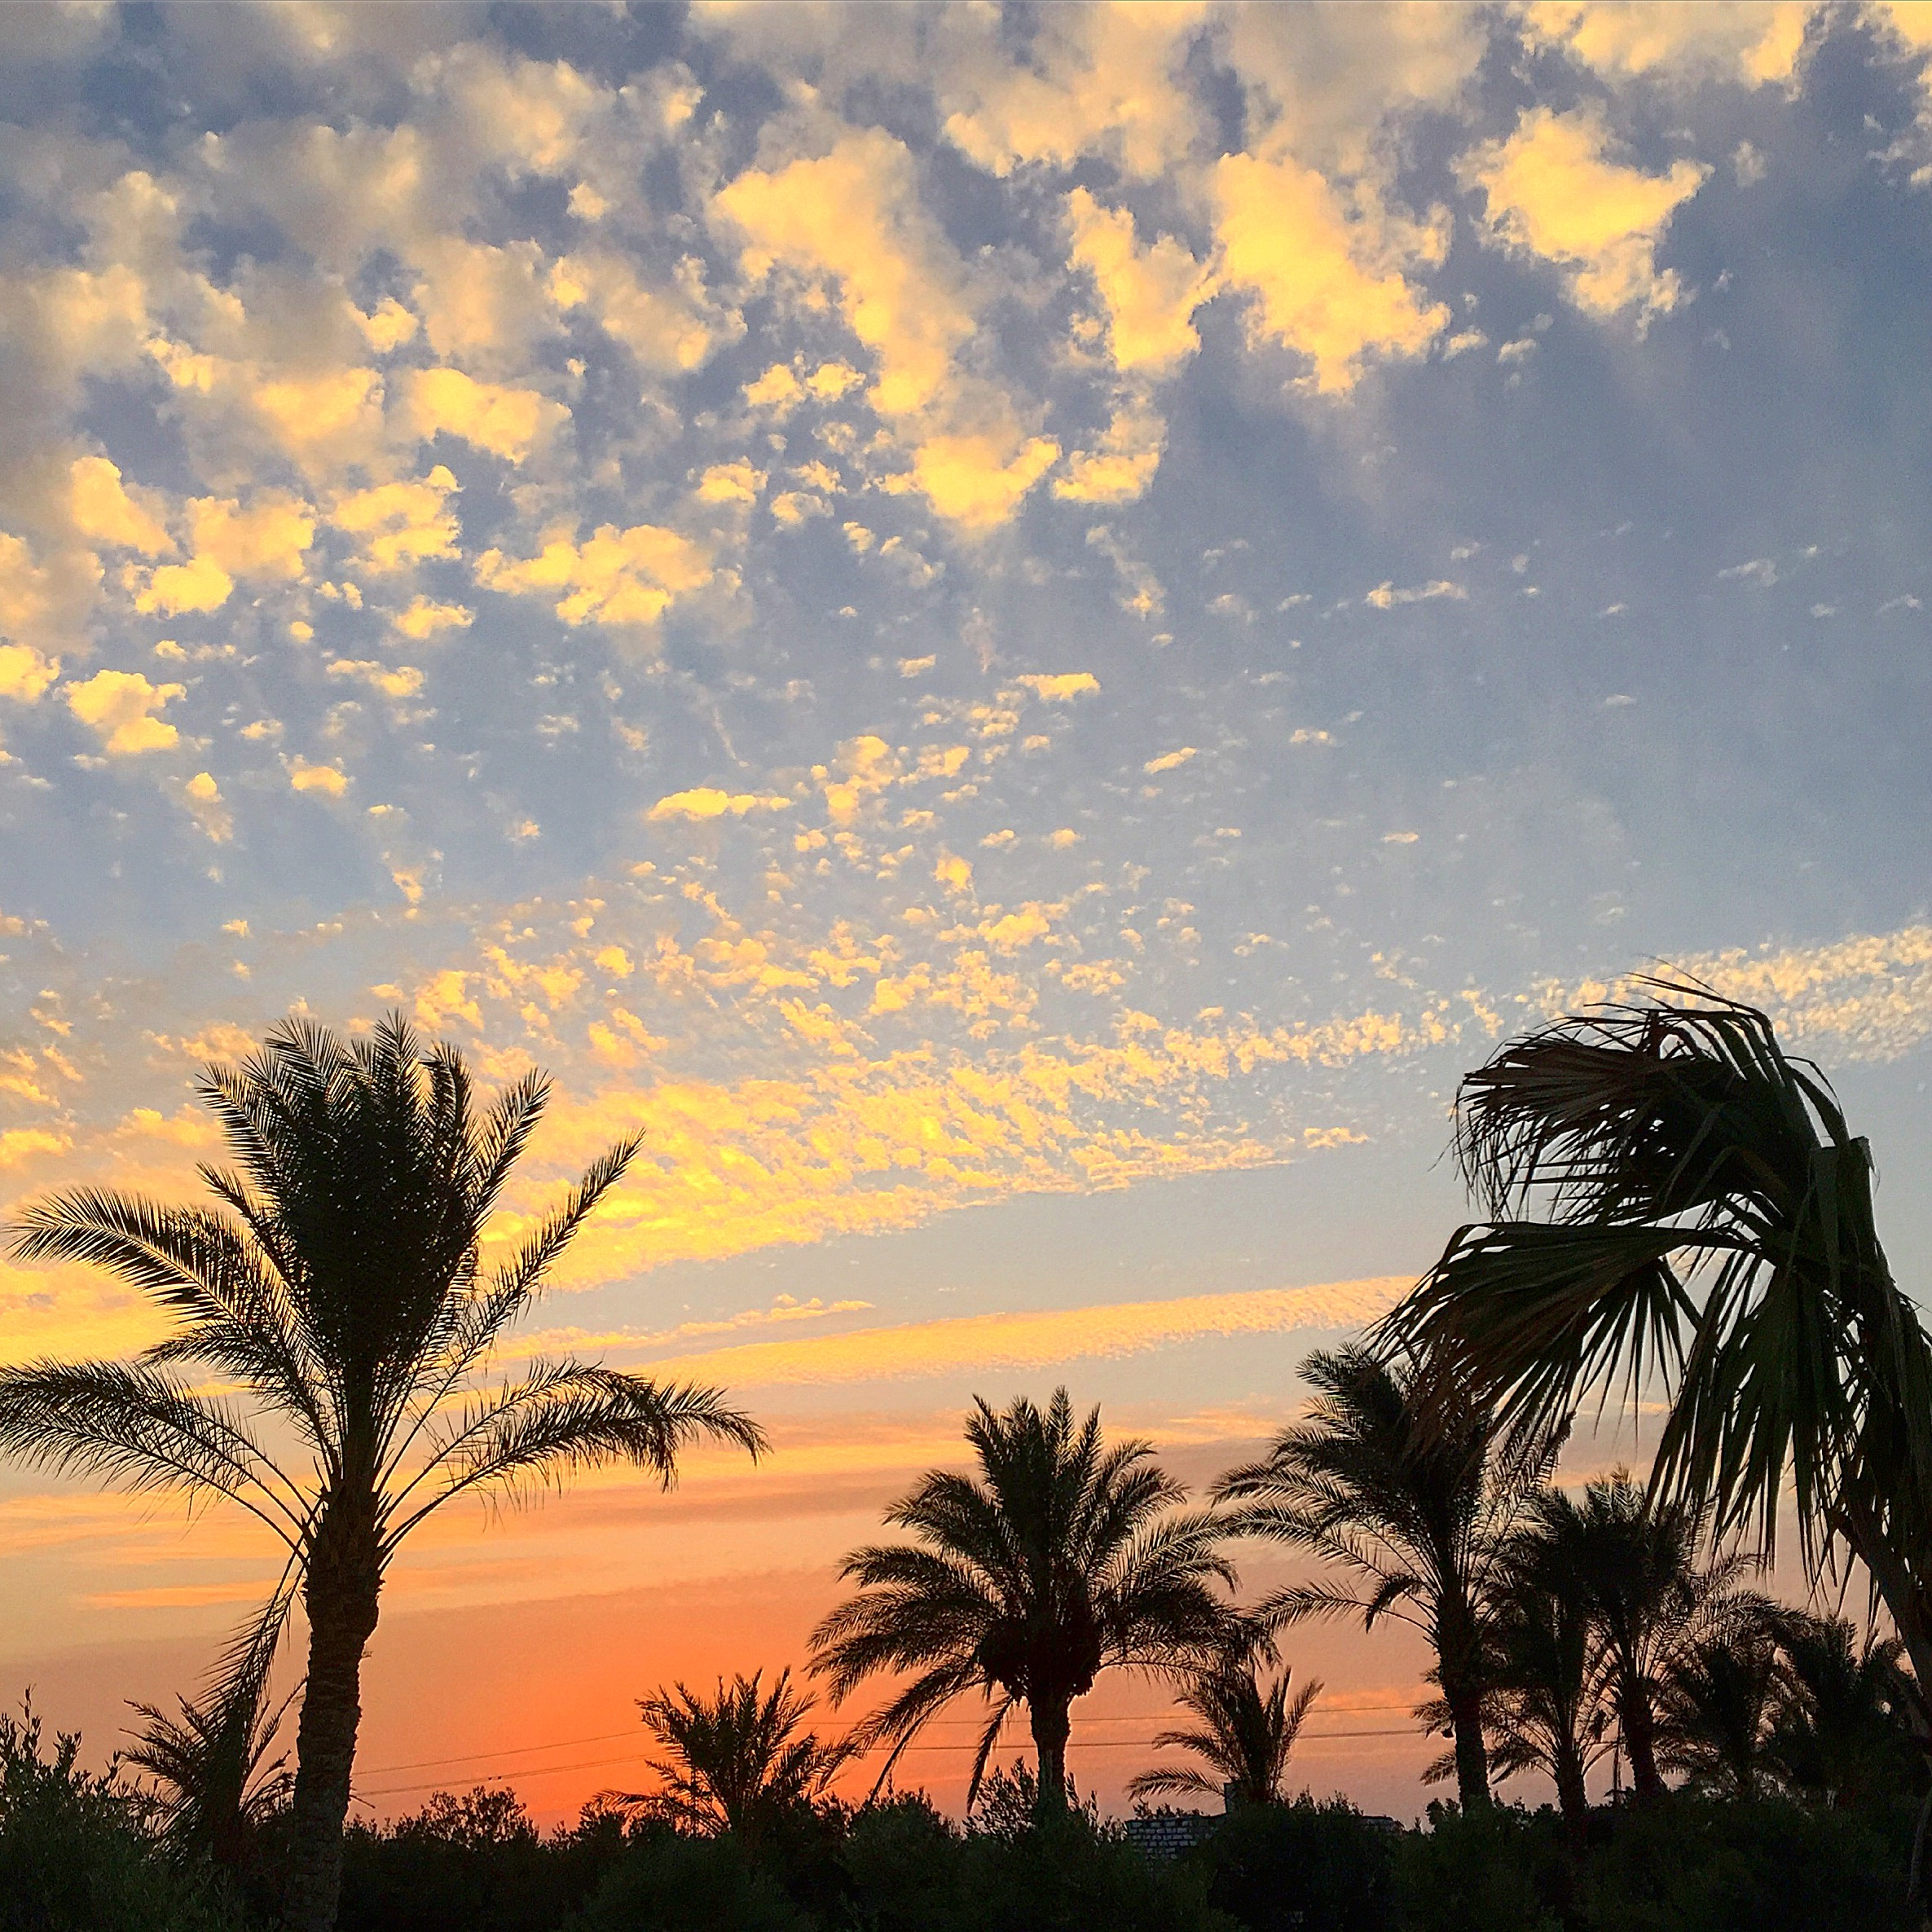 Bawabat, Giza Egypt '15